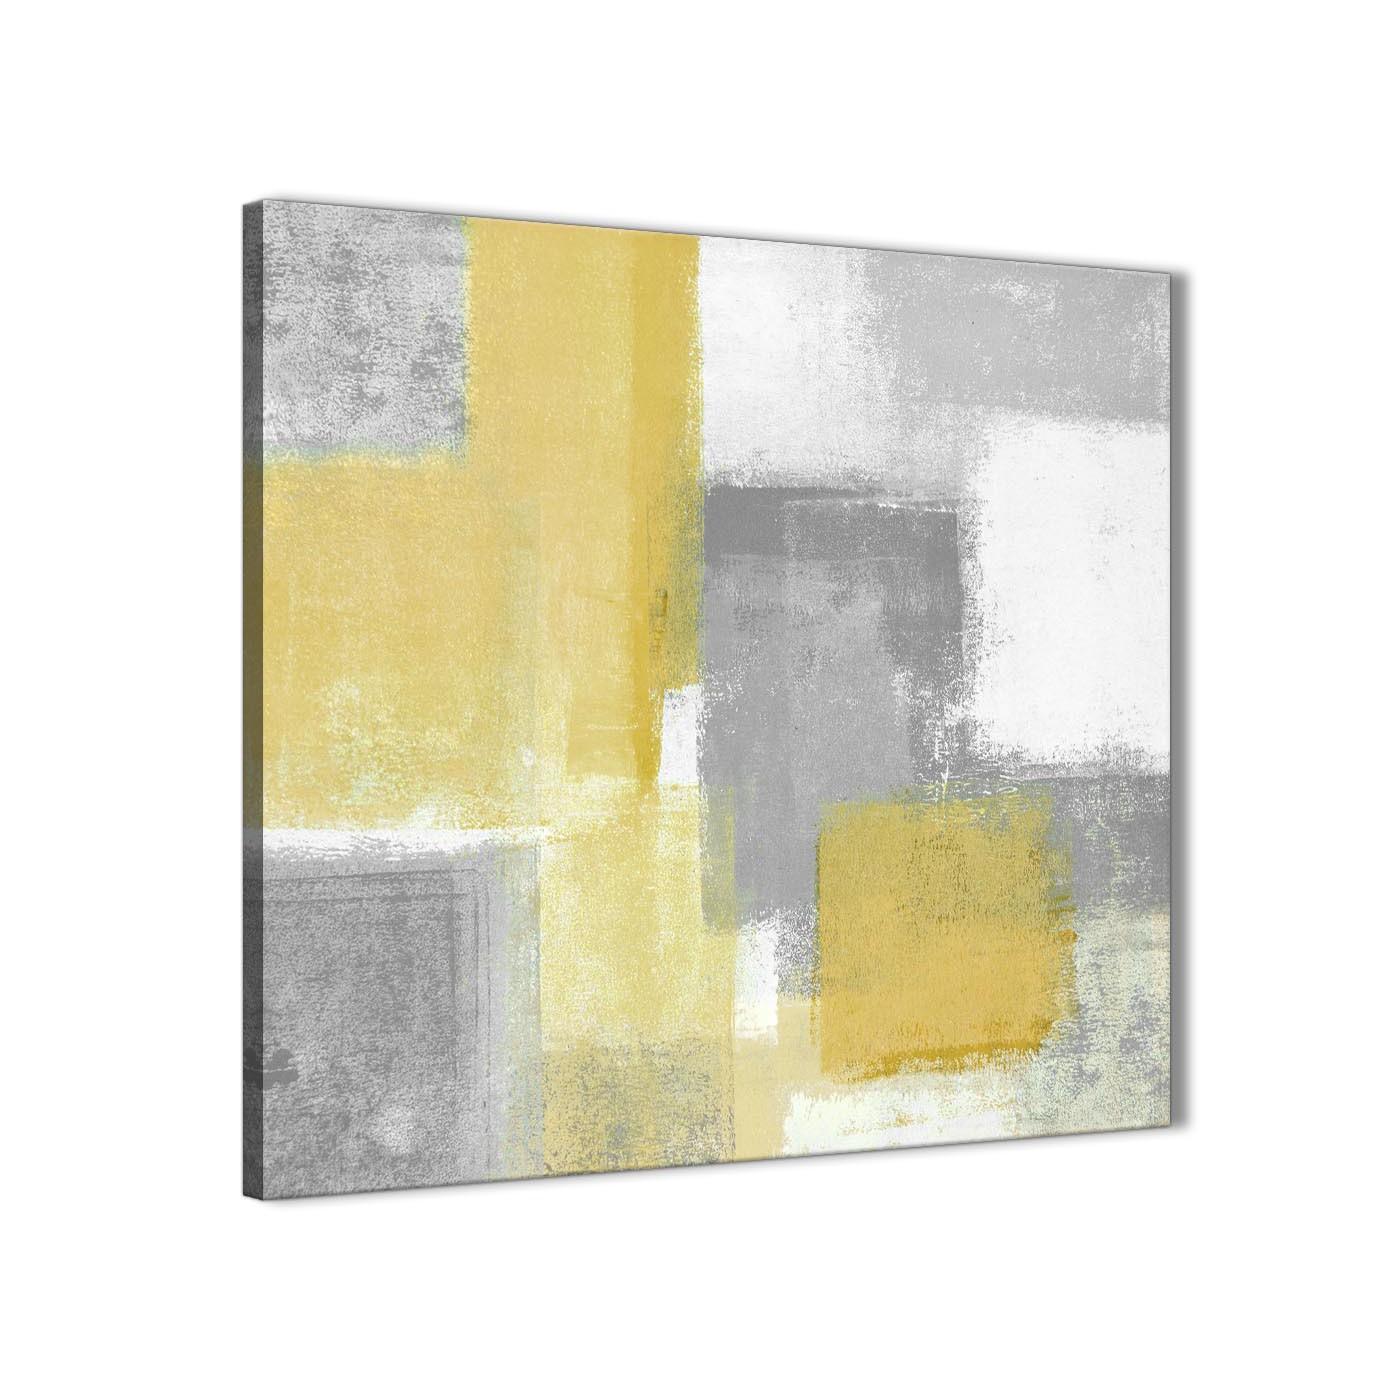 Mustard yellow grey bathroom canvas pictures accessories for Mustard bathroom accessories uk